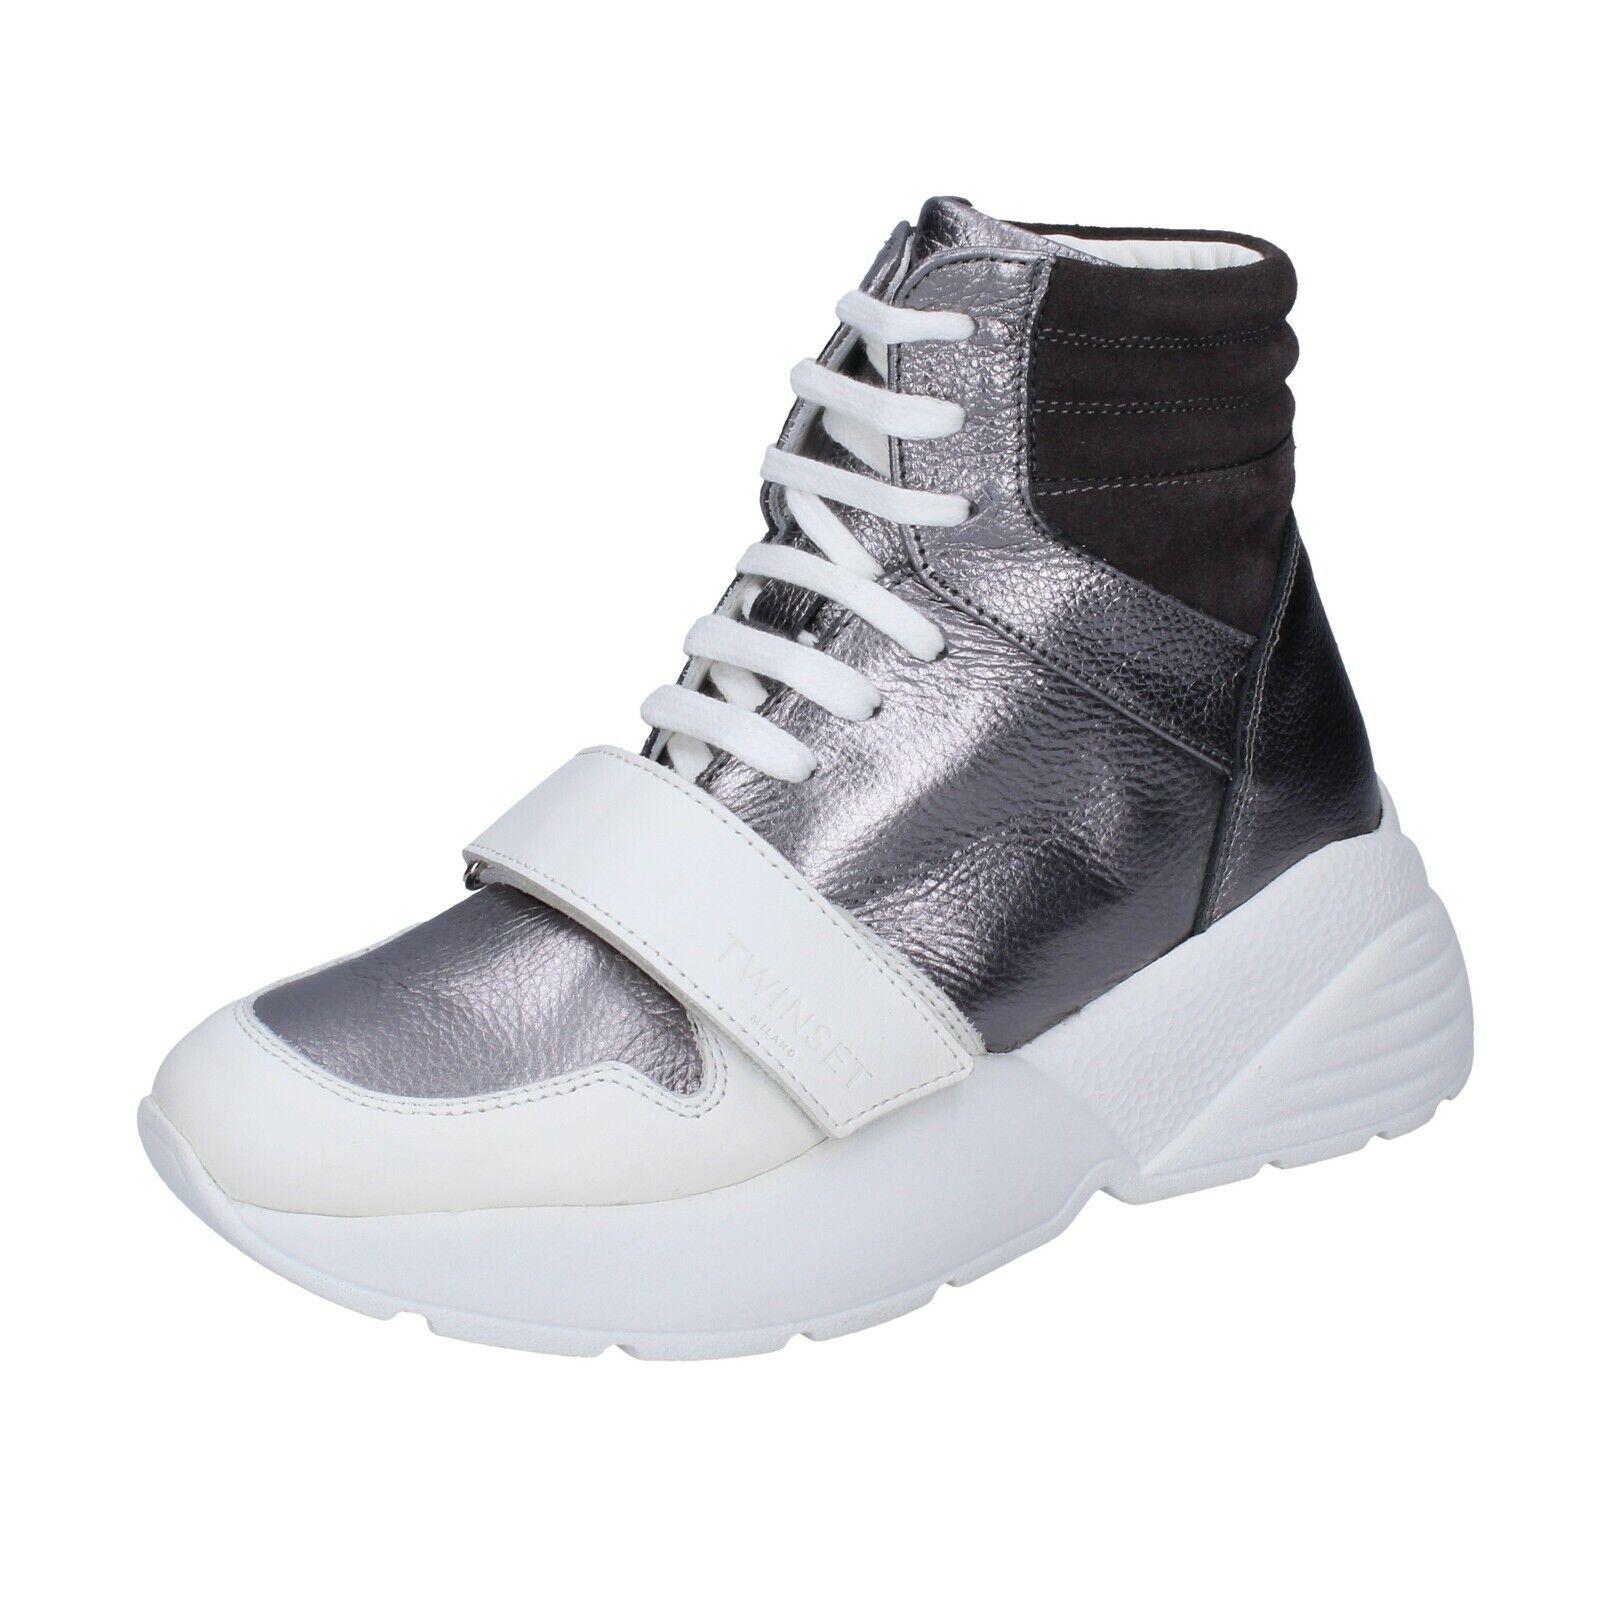 Chaussures Femme TWIN-SET 39 Ue Baskets Gris Cuir Blanc en Daim BJ482-39